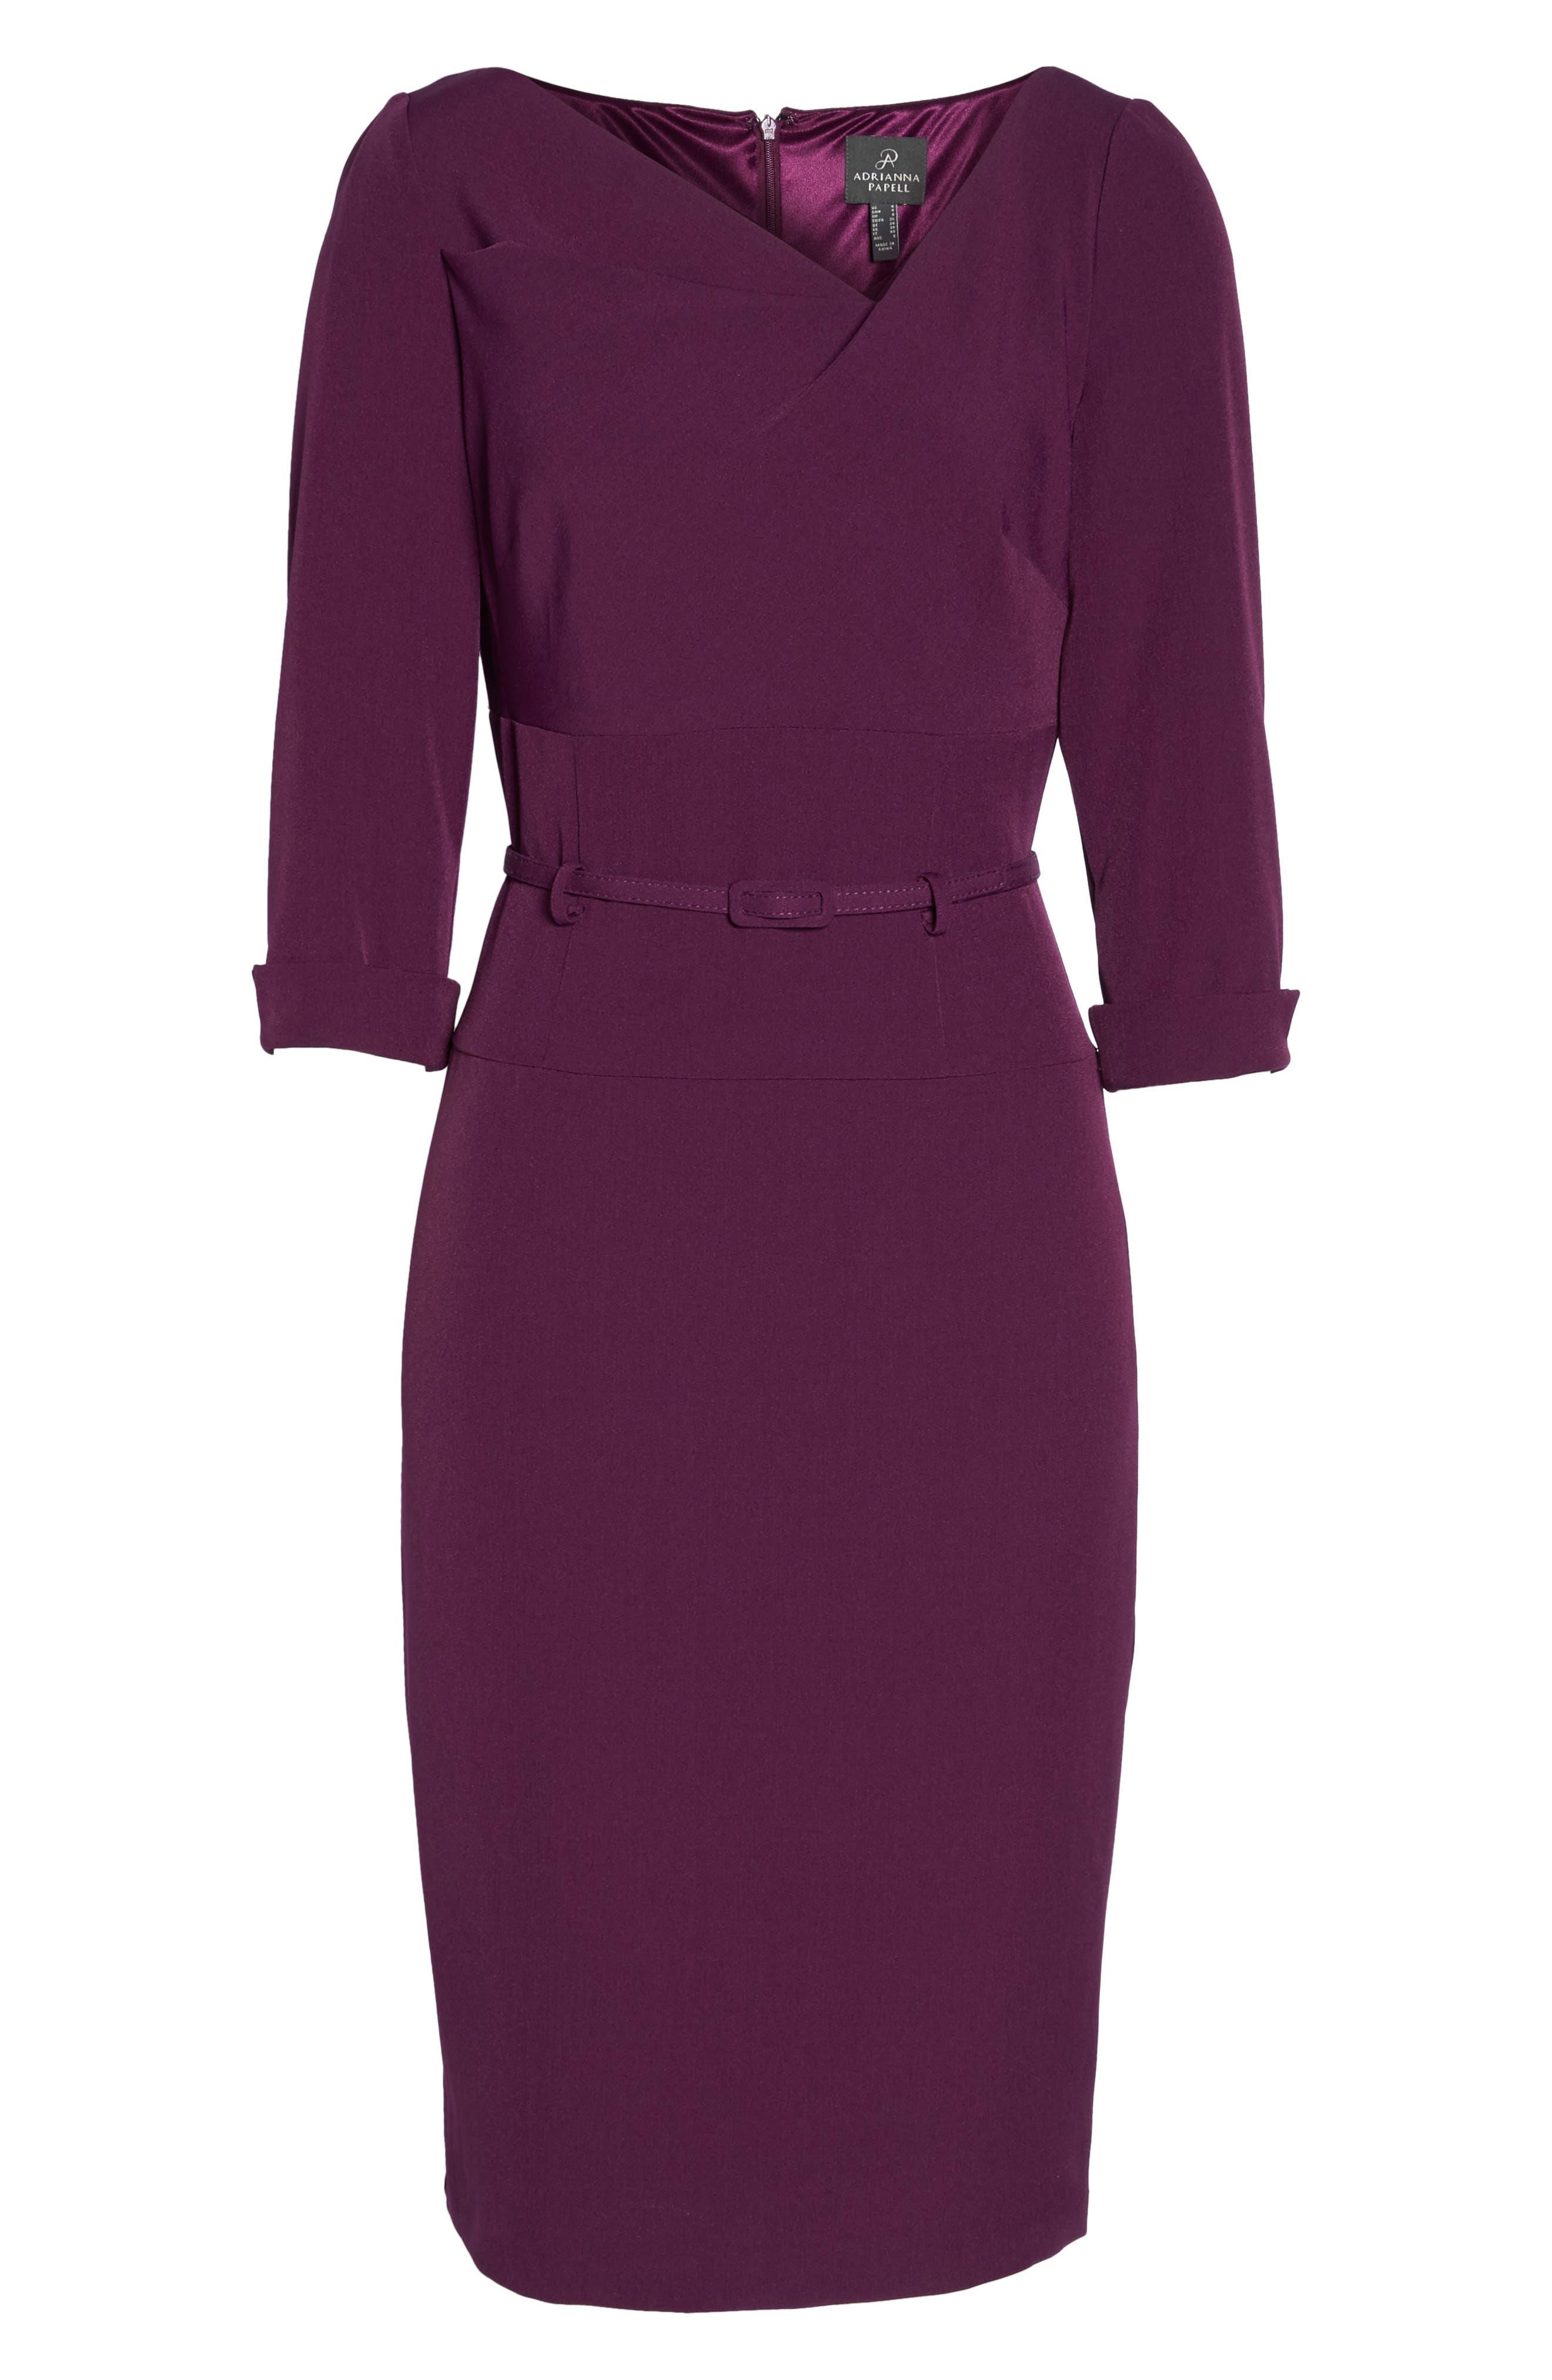 Belted Crepe Sheath Dress,                             Alternate thumbnail 7, color,                             606